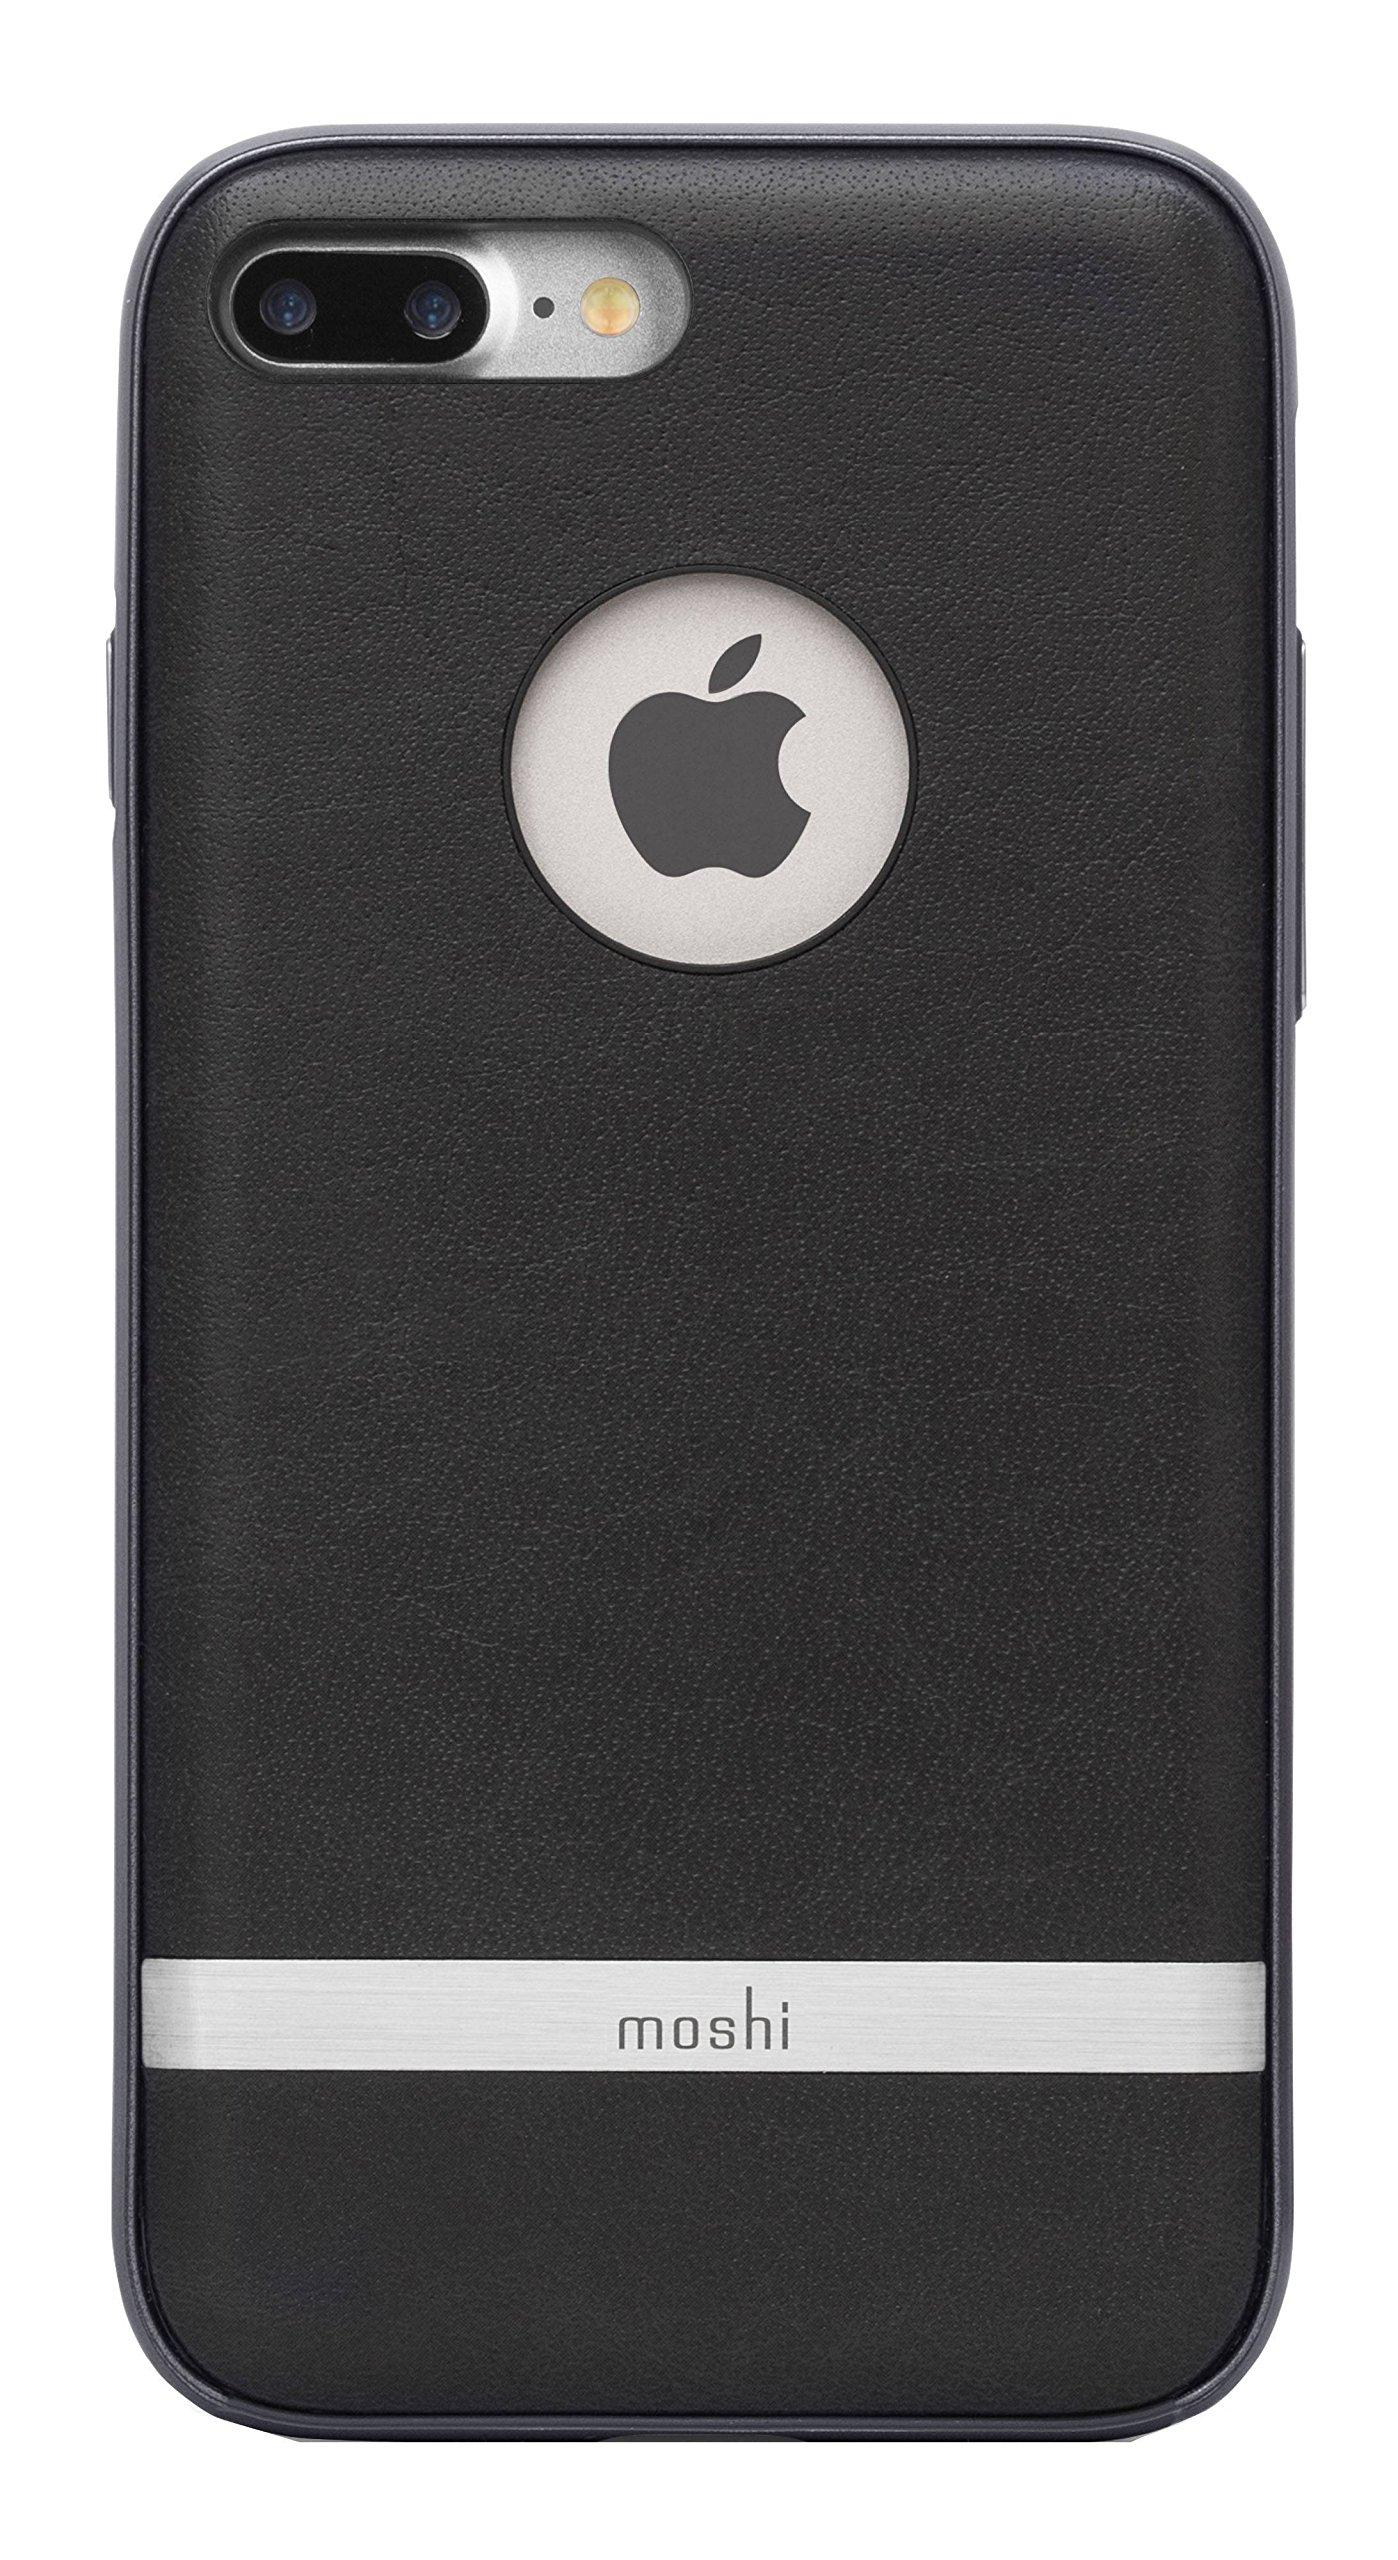 Moshi Napa Vegan Leather Case for iPhone 7 Plus 8